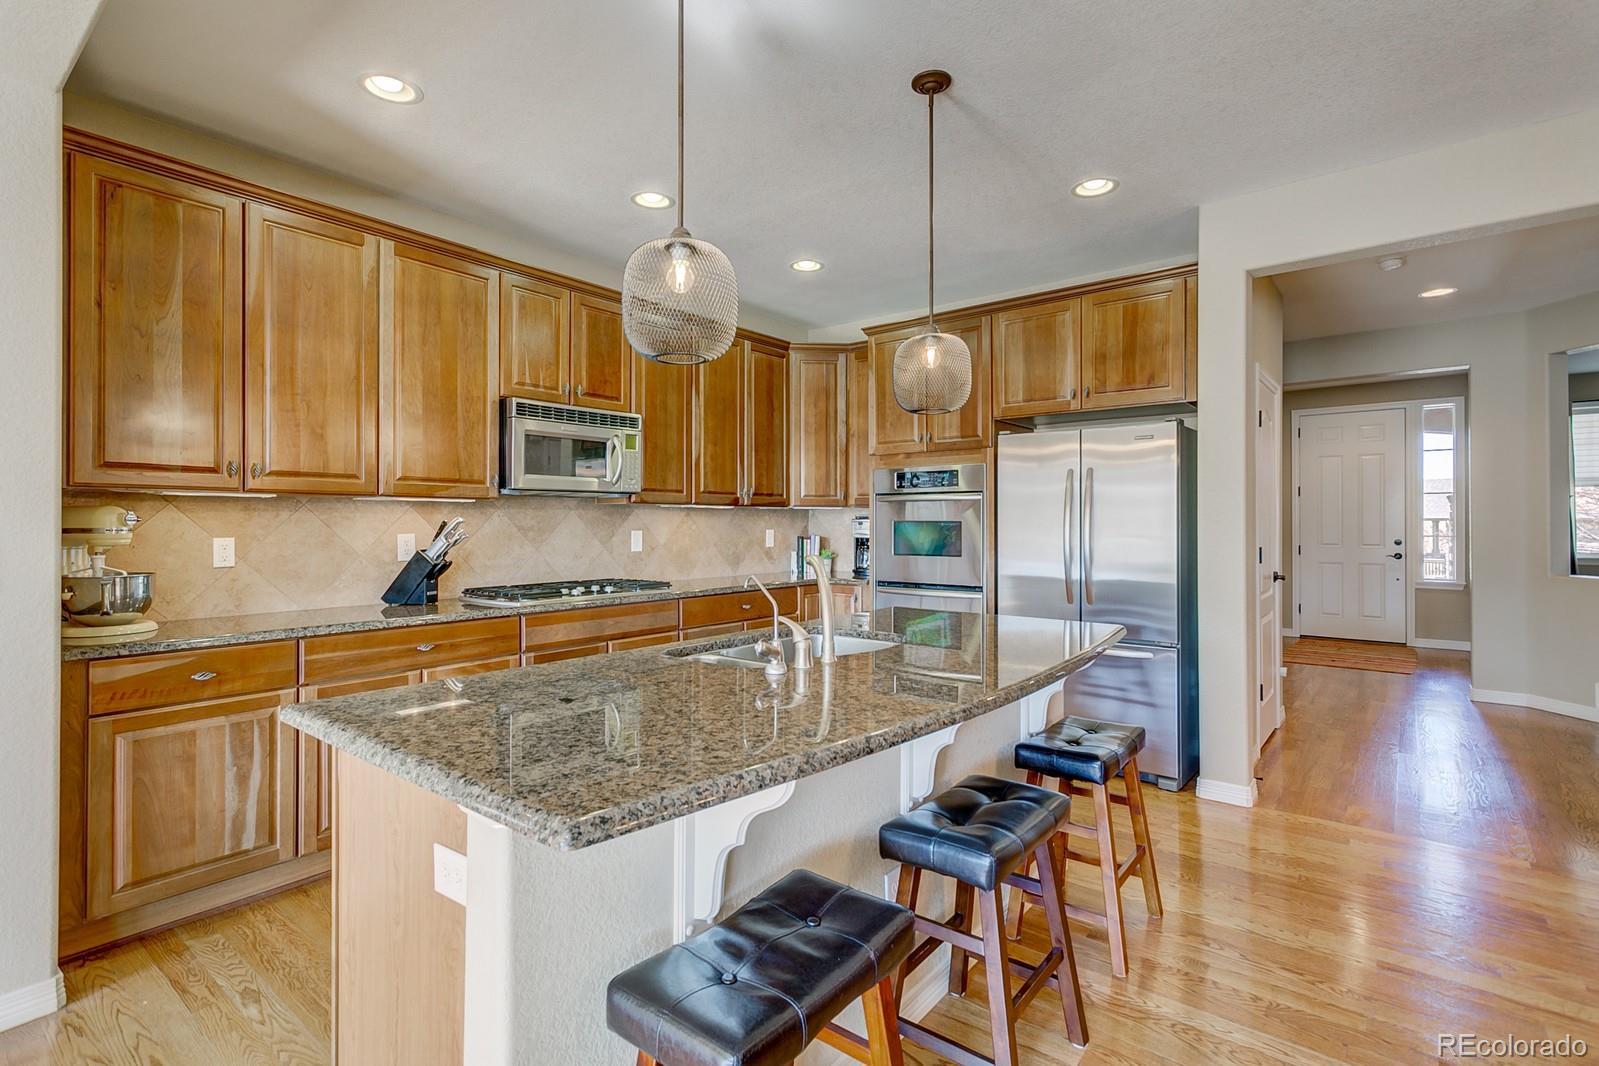 MLS# 6747511 - 4 - 4568 Valleybrook Drive, Highlands Ranch, CO 80130